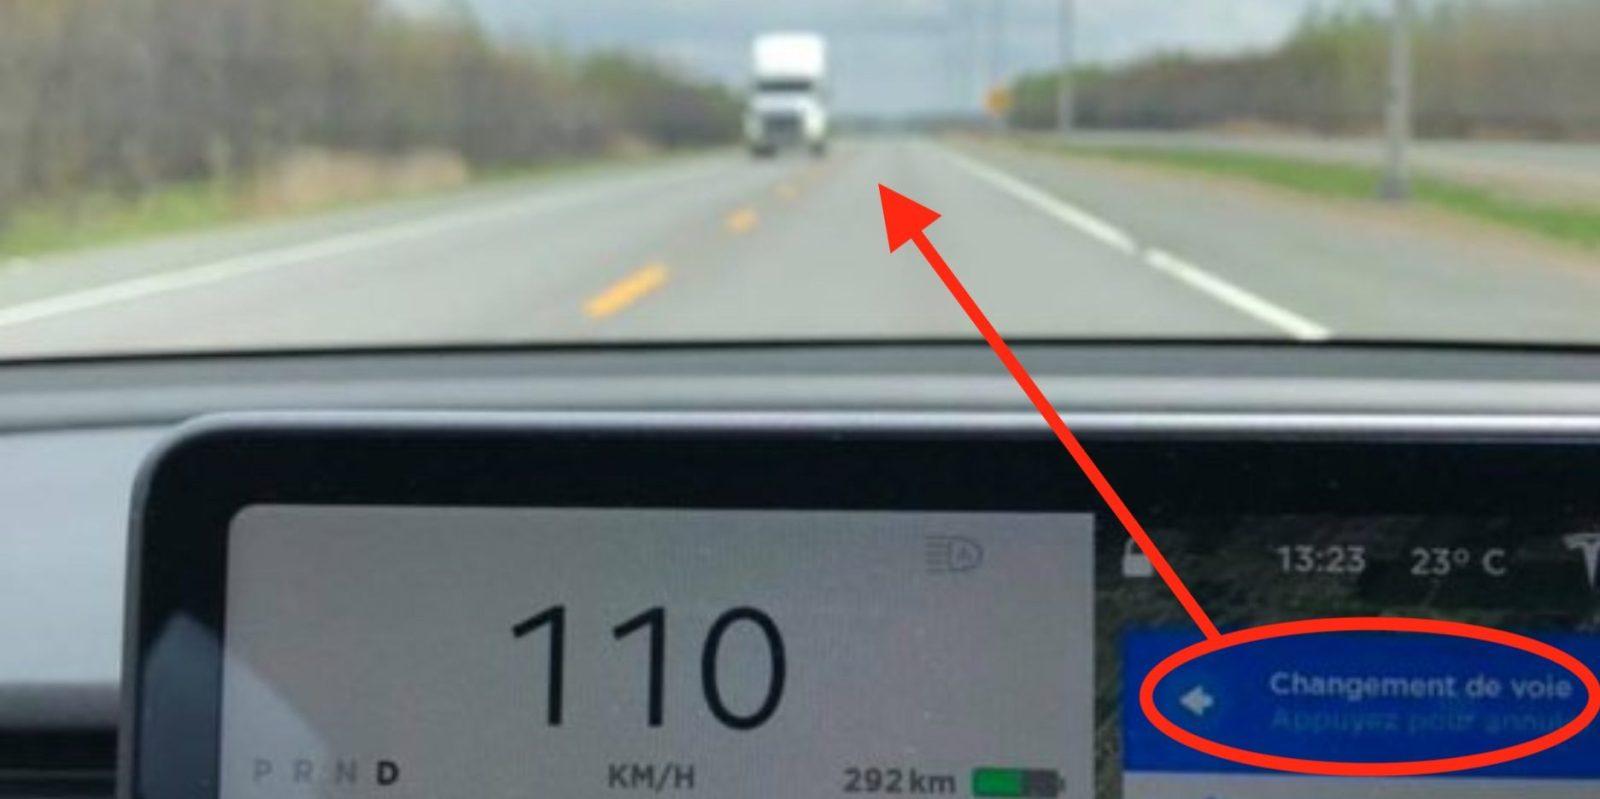 Tesla Autopilot suggests lane change into oncoming traffic